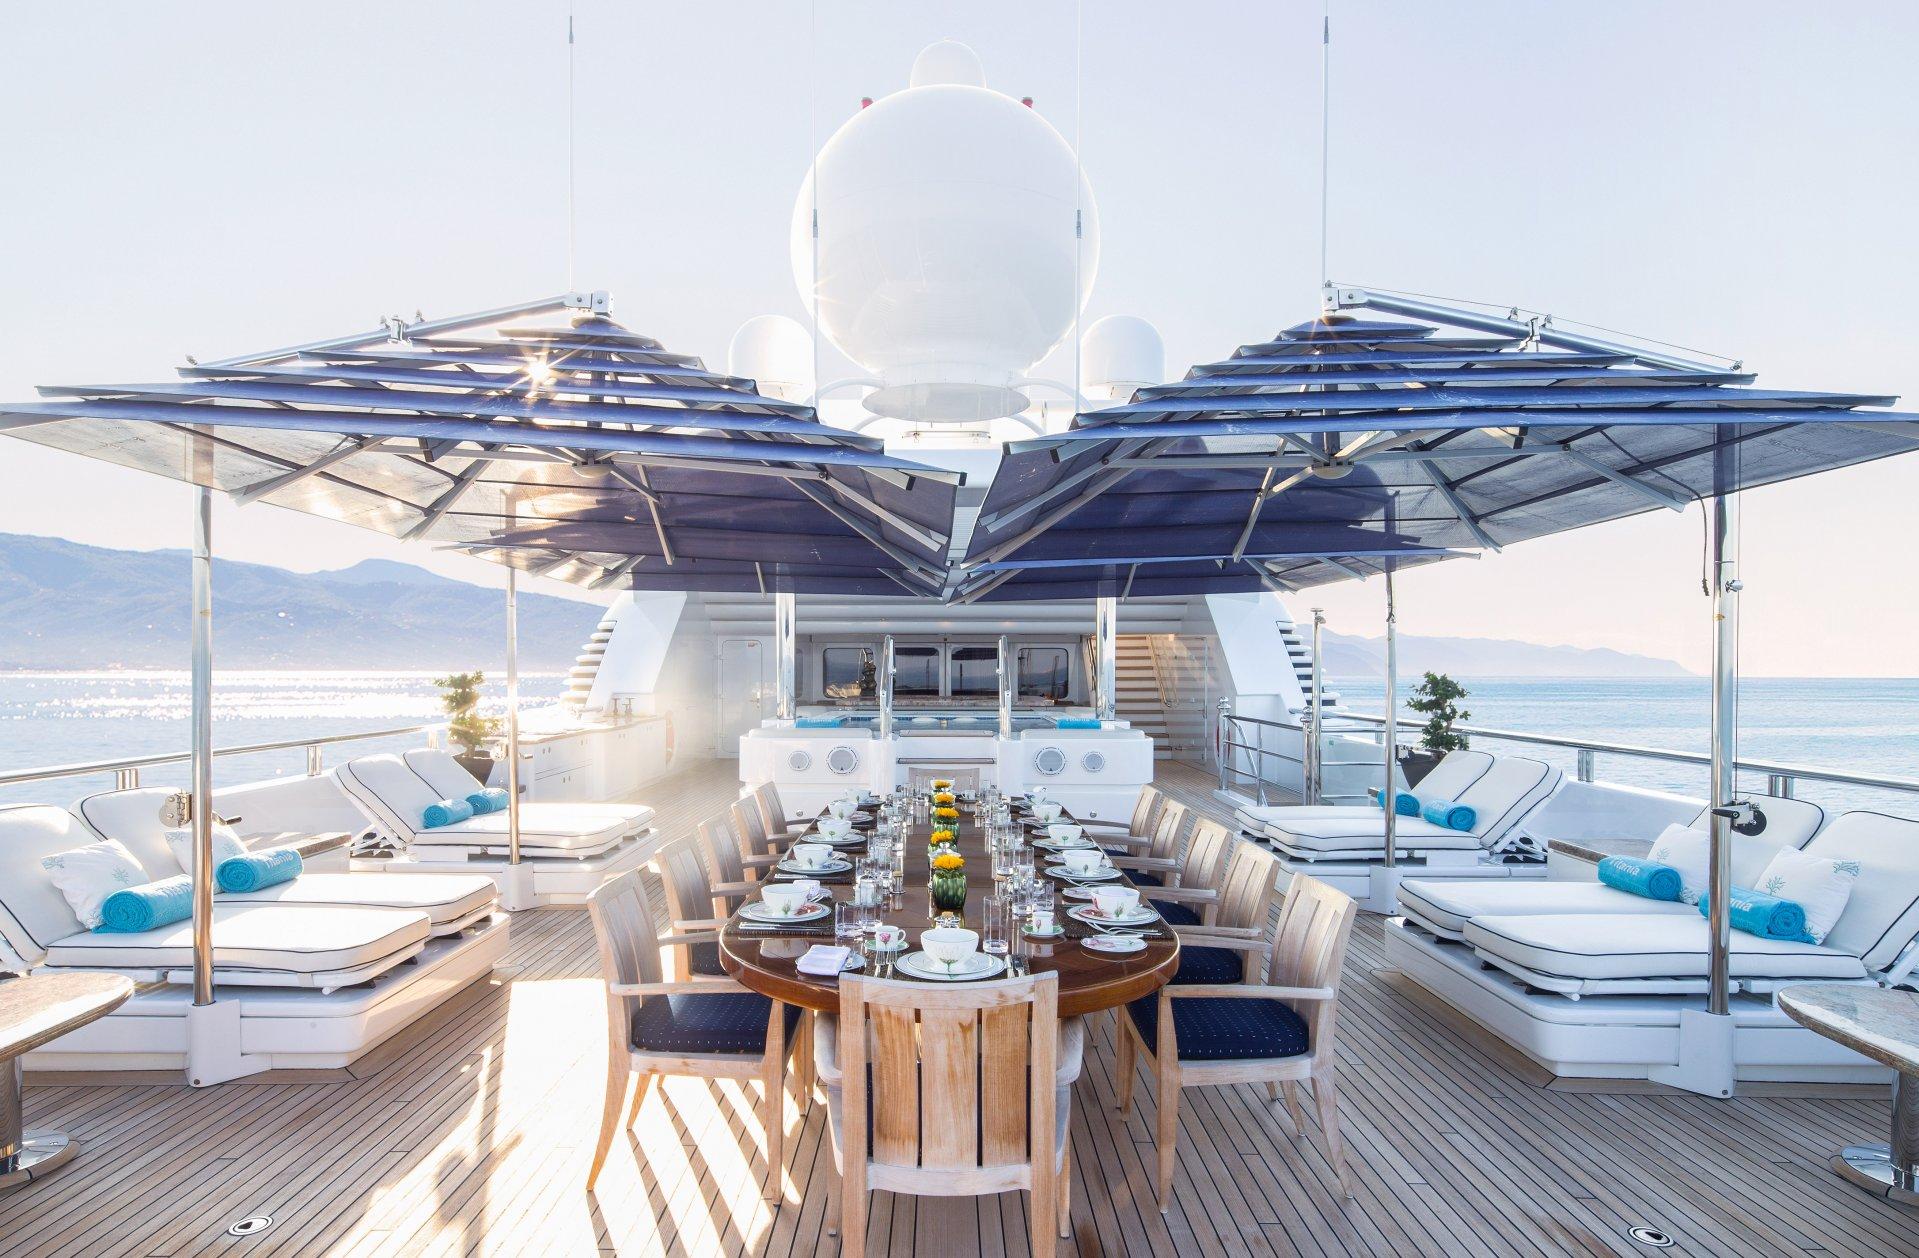 Pool Deck - Alfresco Dining Area Sunbathing